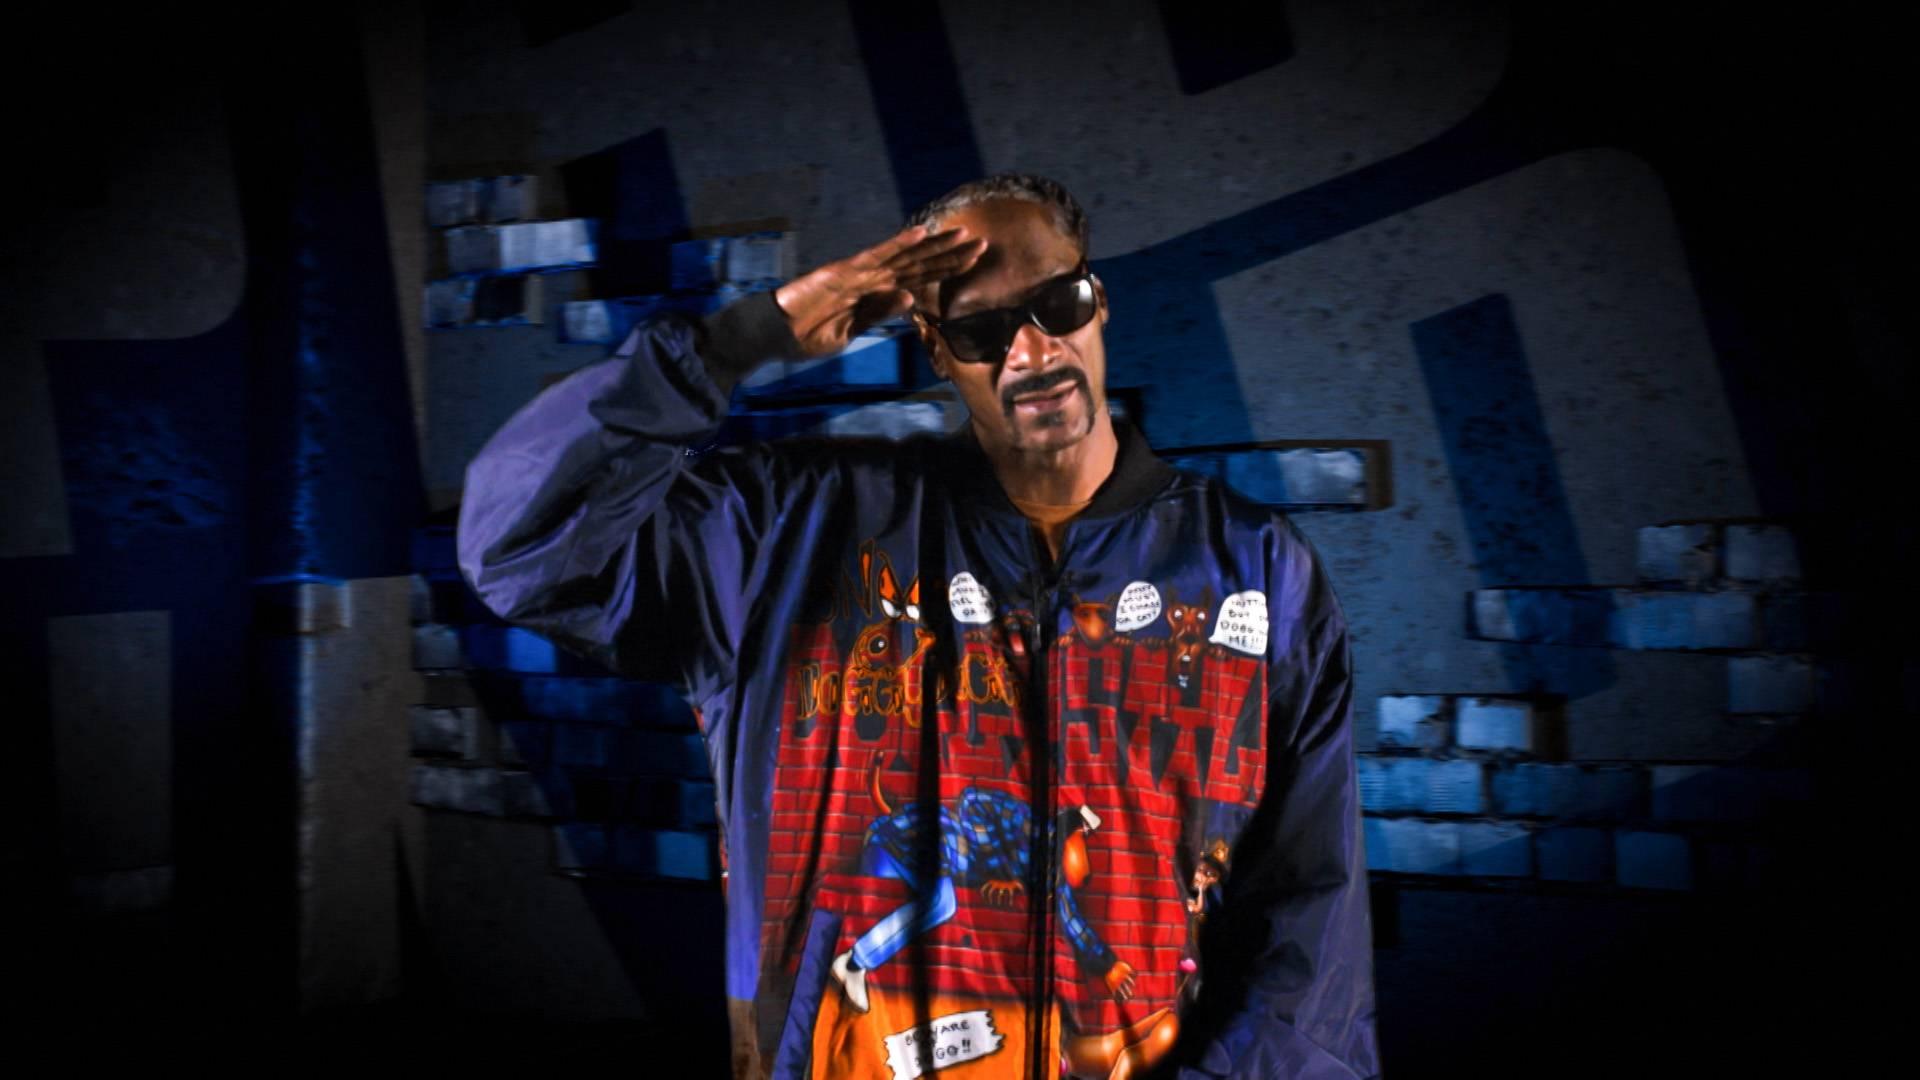 Hip Hop Awards 2020 | Show Highlights Gallery Snoop Dogg | 1920x1080